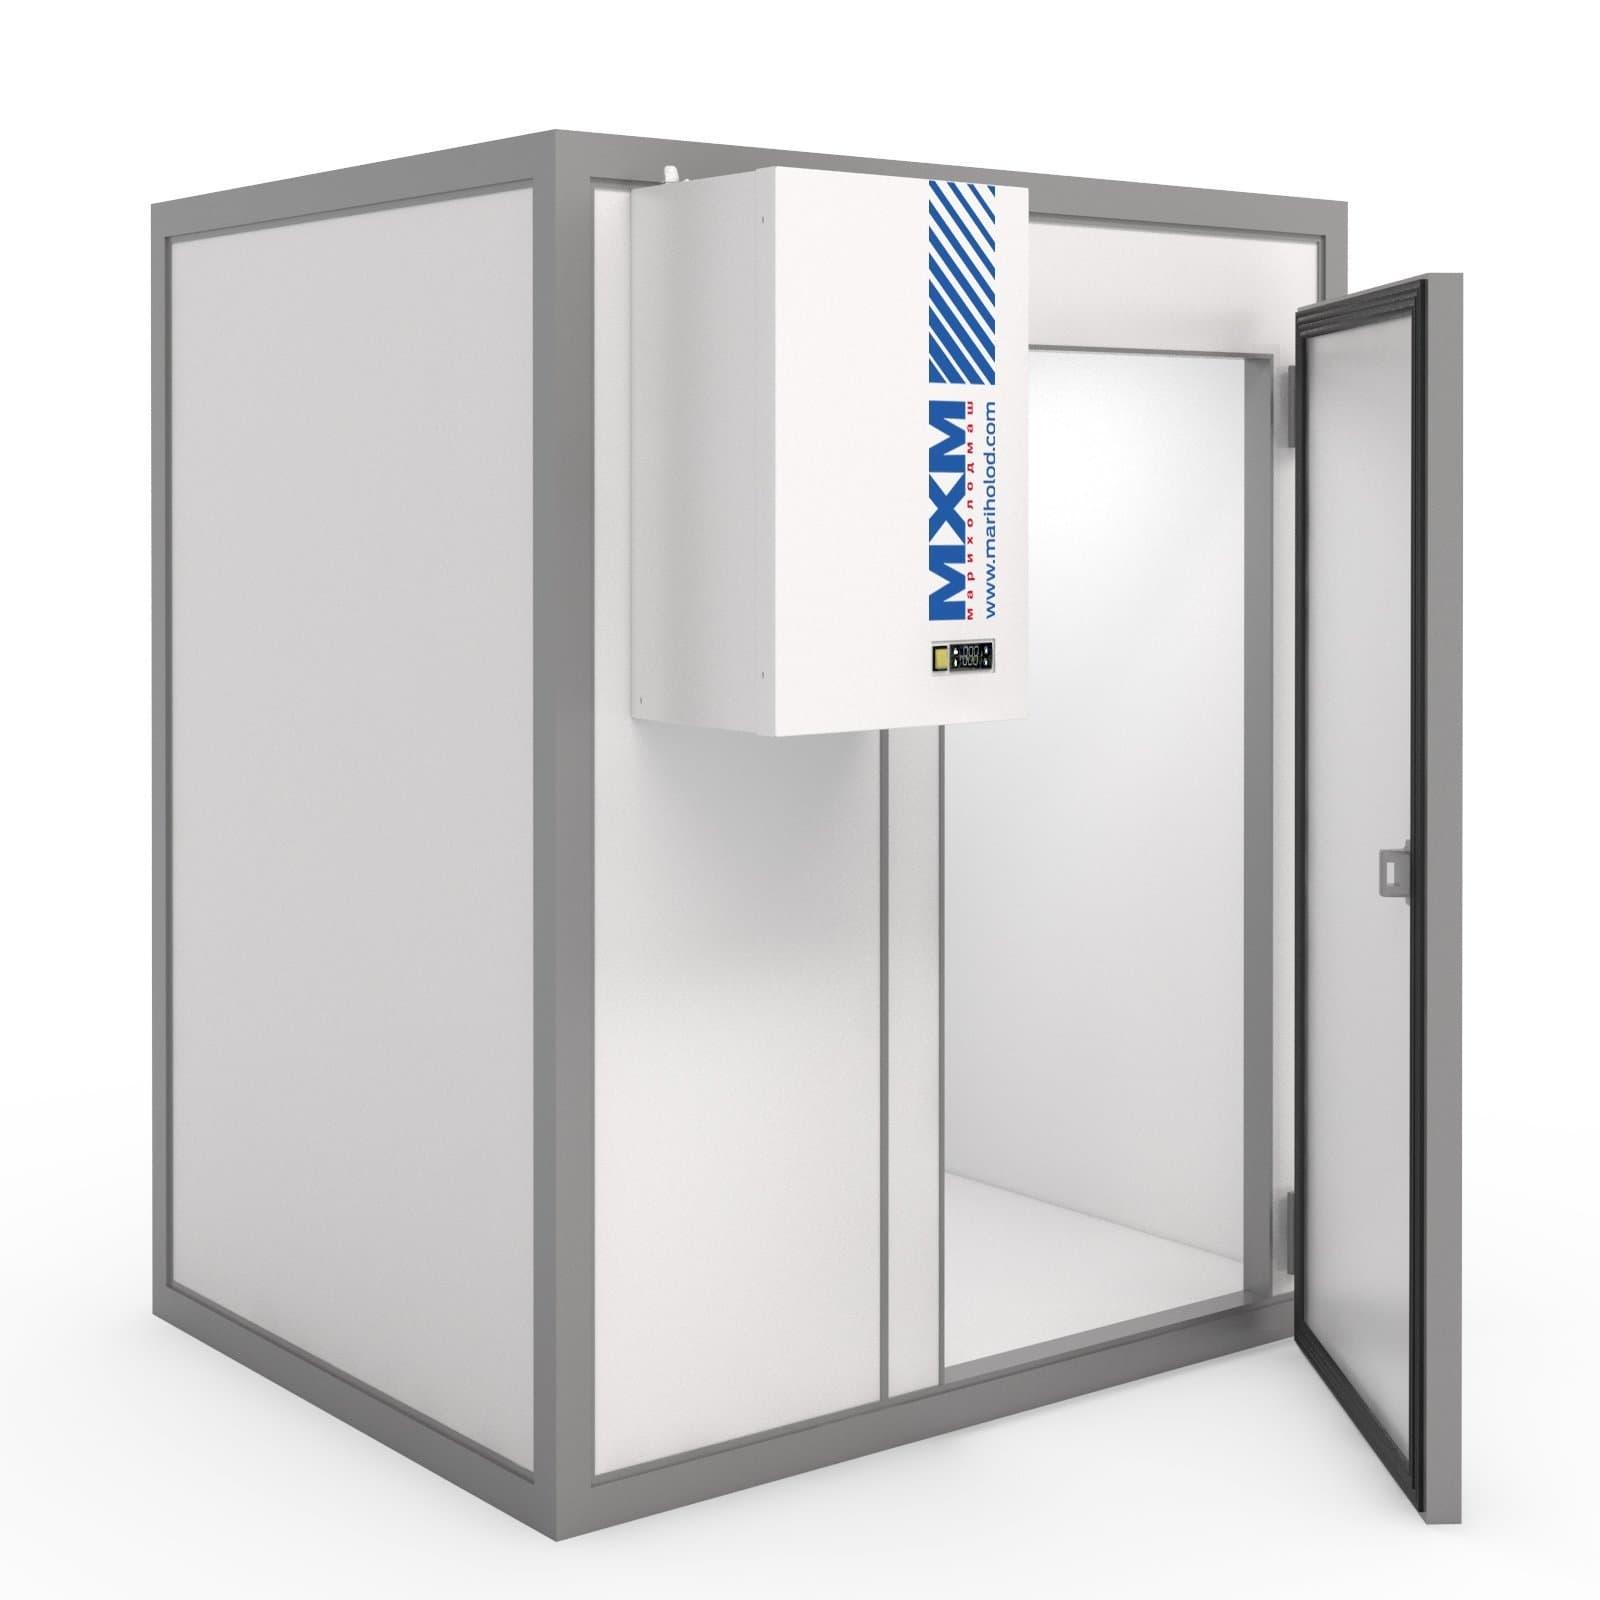 Камера холодильная МХМ КХН-28,98 1660×8560×2460